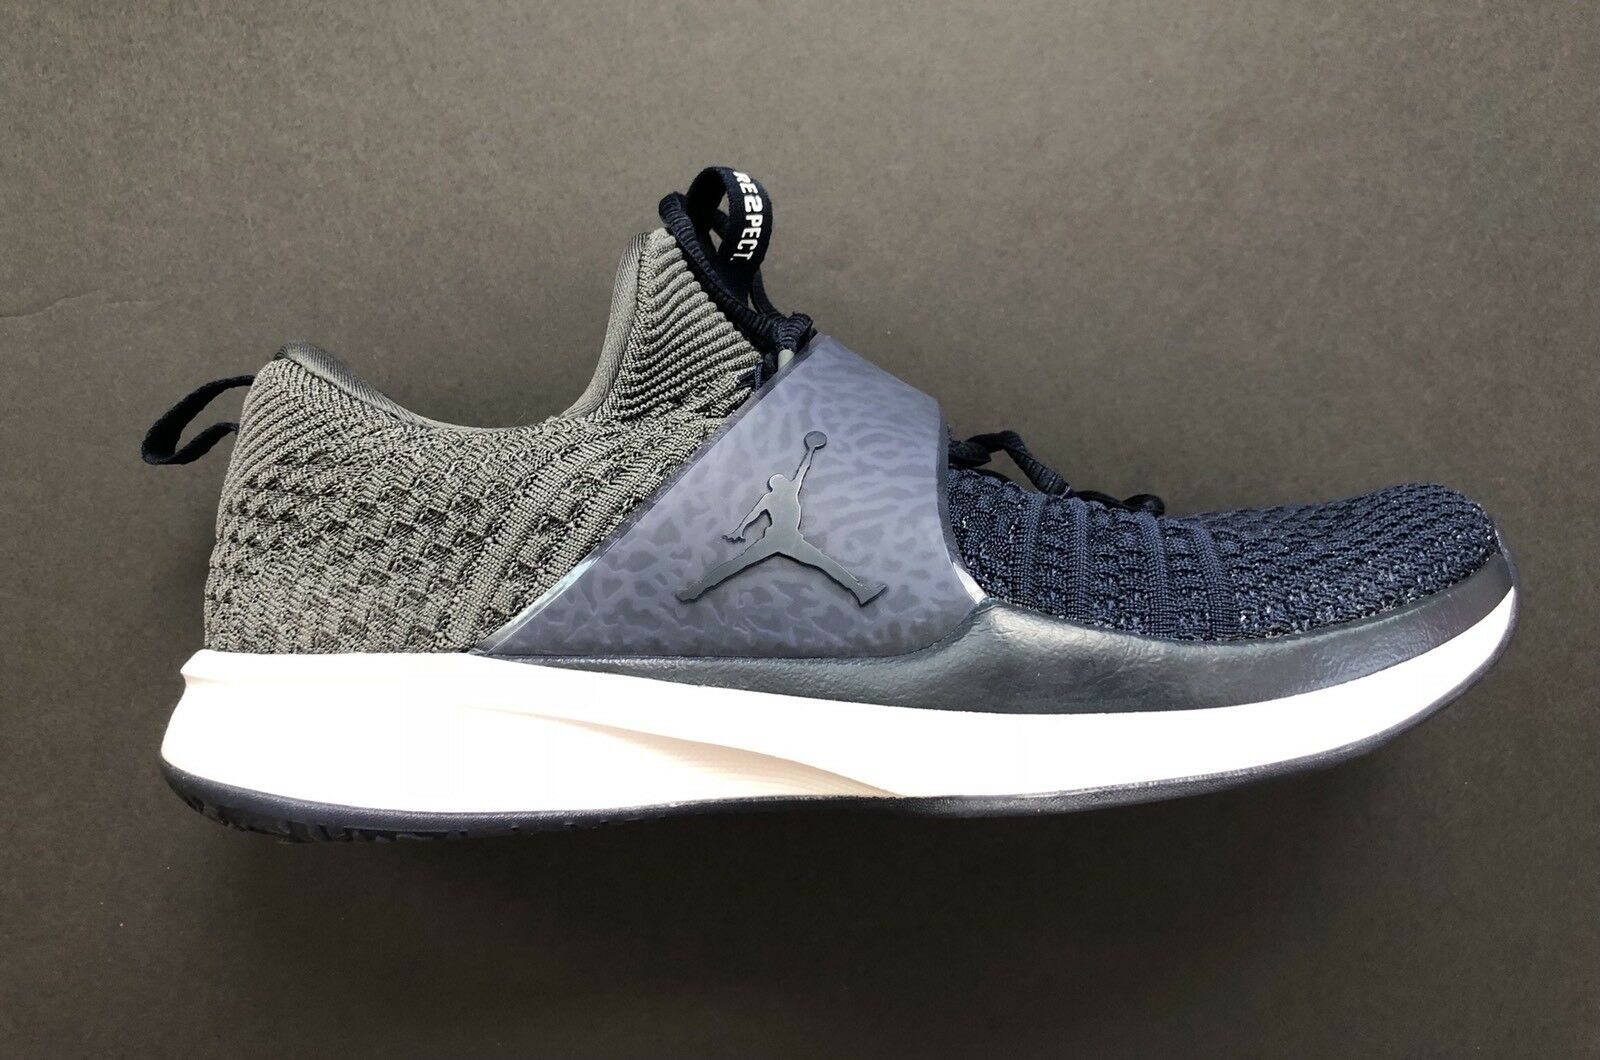 Nike Jordan Trainer 2 Flyknit Re2pect 921210-106 Derek Jeter Yankees 921210-106 Re2pect Size 12.5